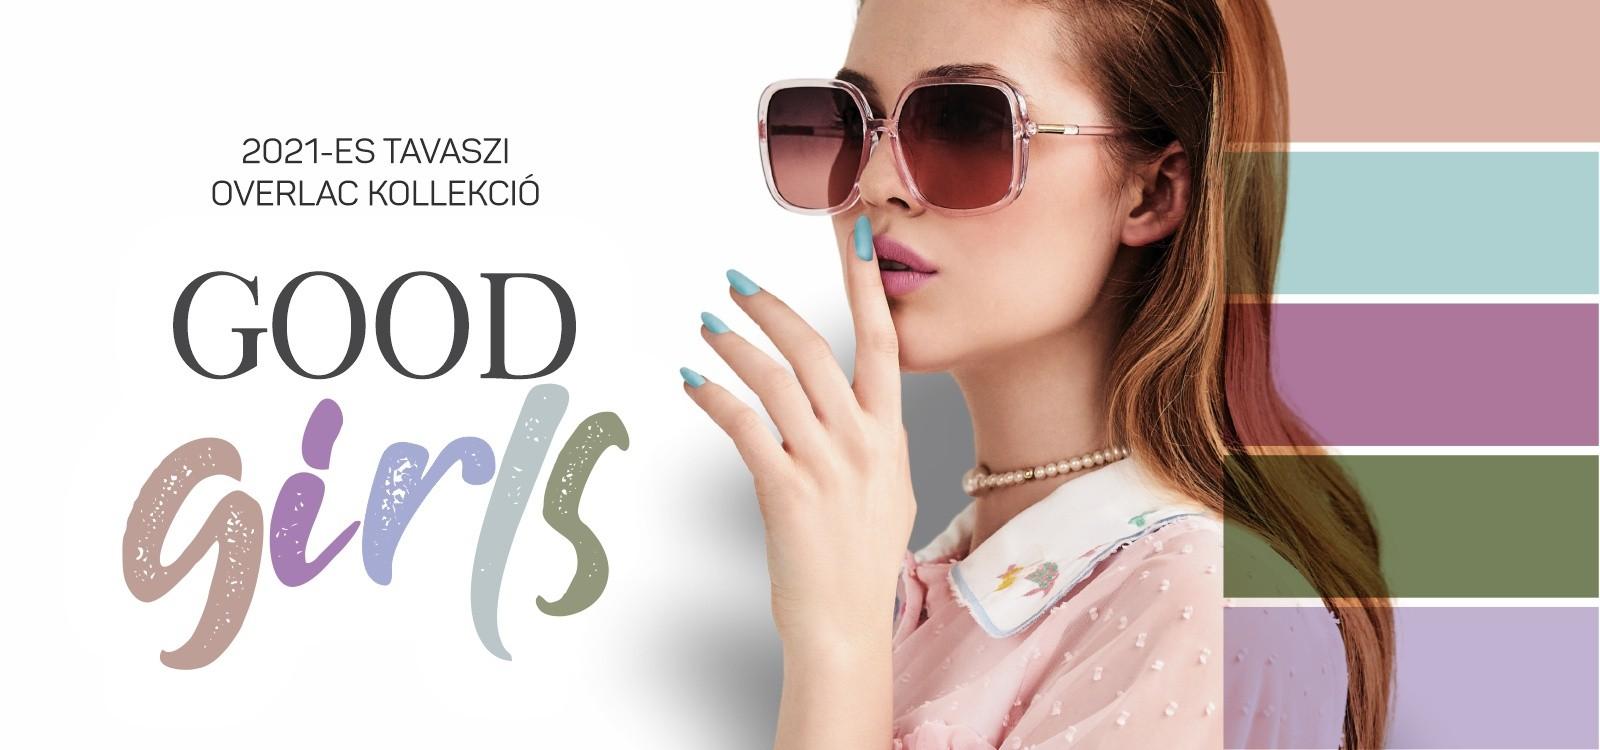 Overlac - Good Girls Kollekció 2021